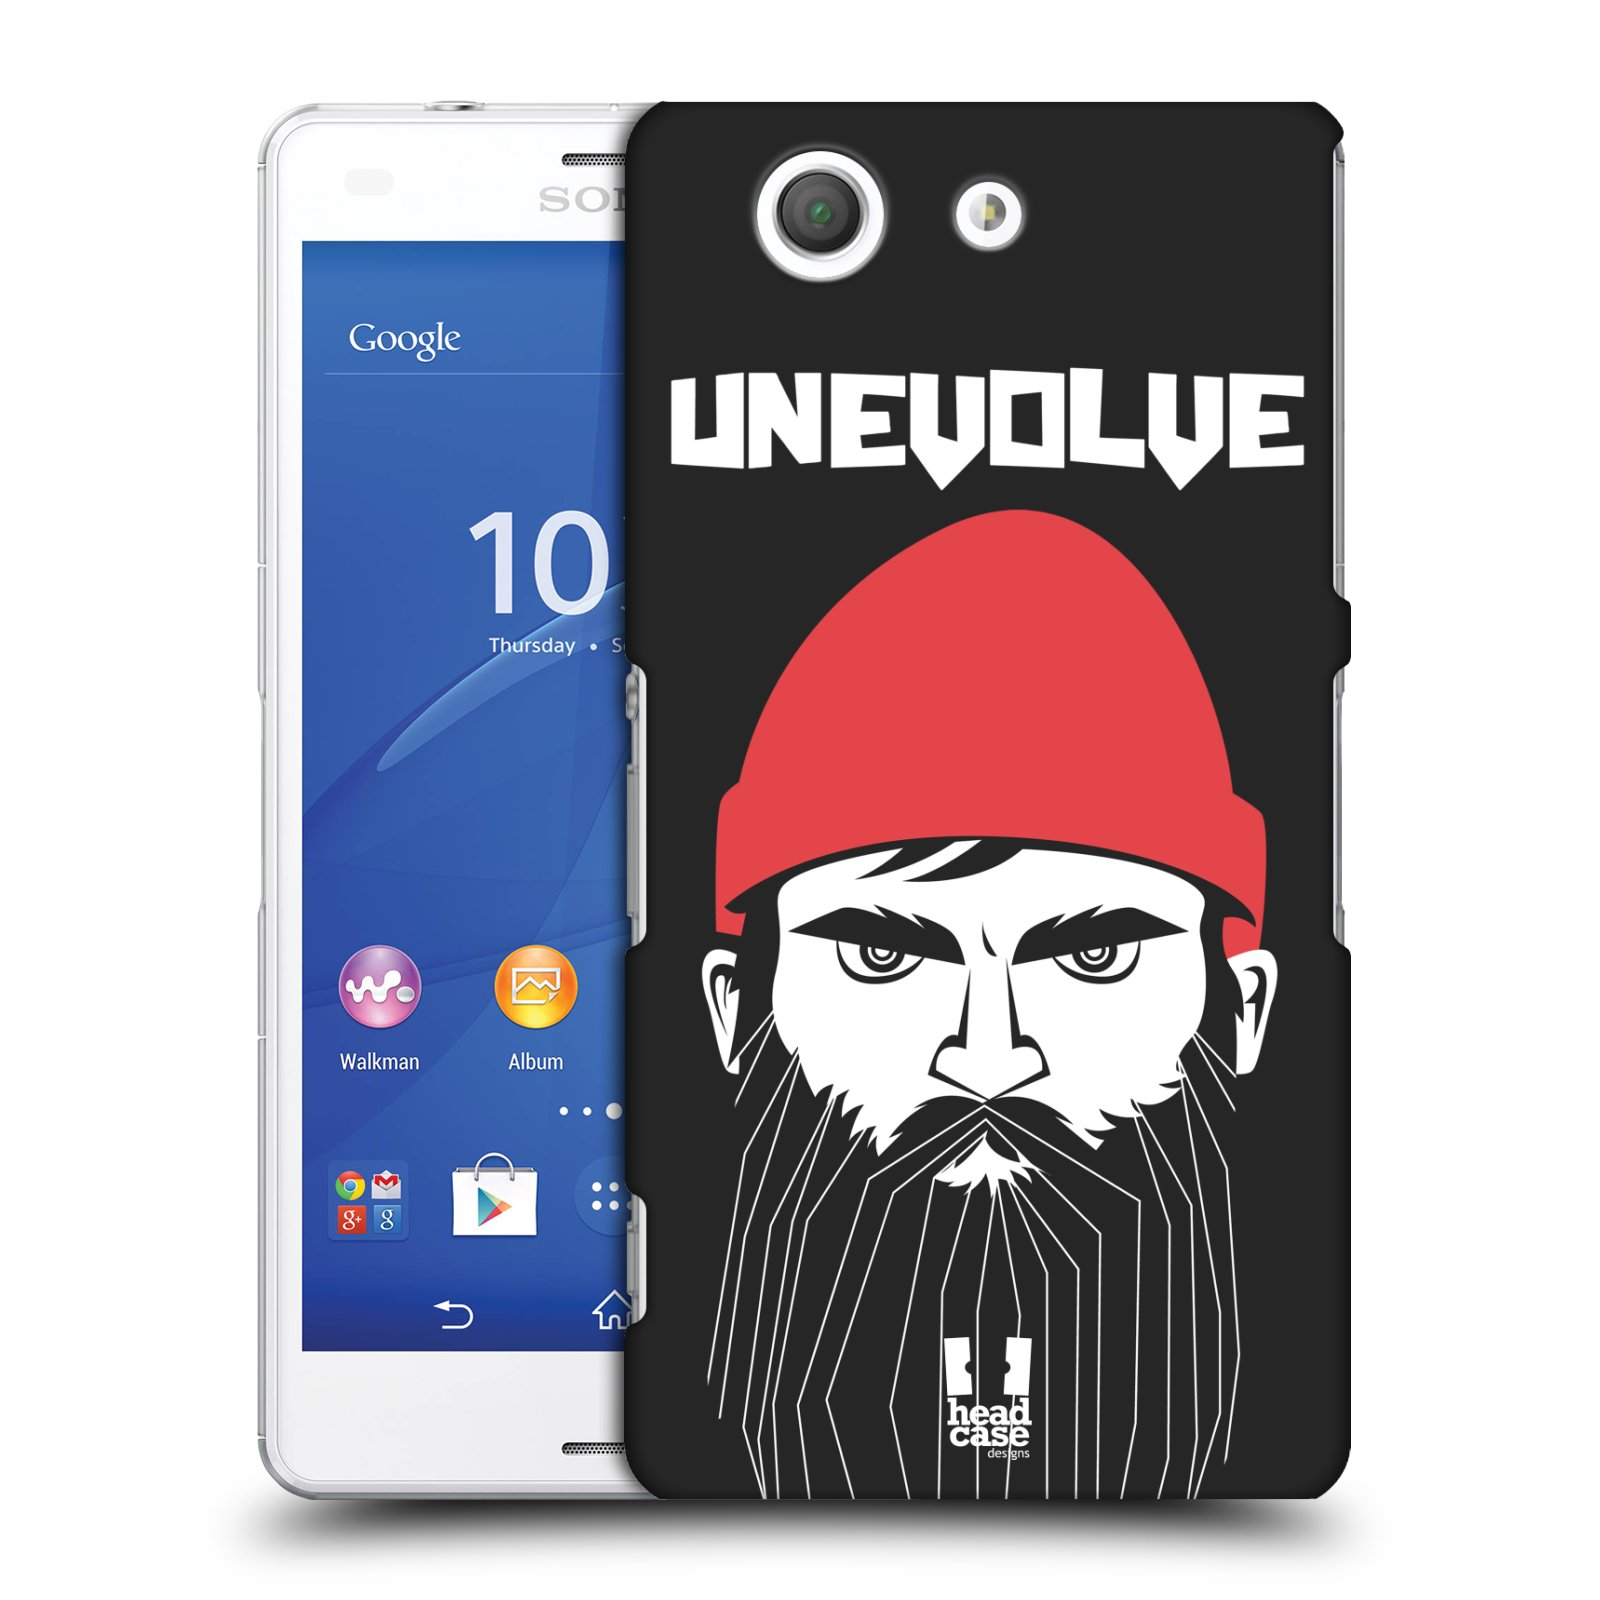 Plastové pouzdro na mobil Sony Xperia Z3 Compact D5803 HEAD CASE KNÍRAČ UNEVOLVE